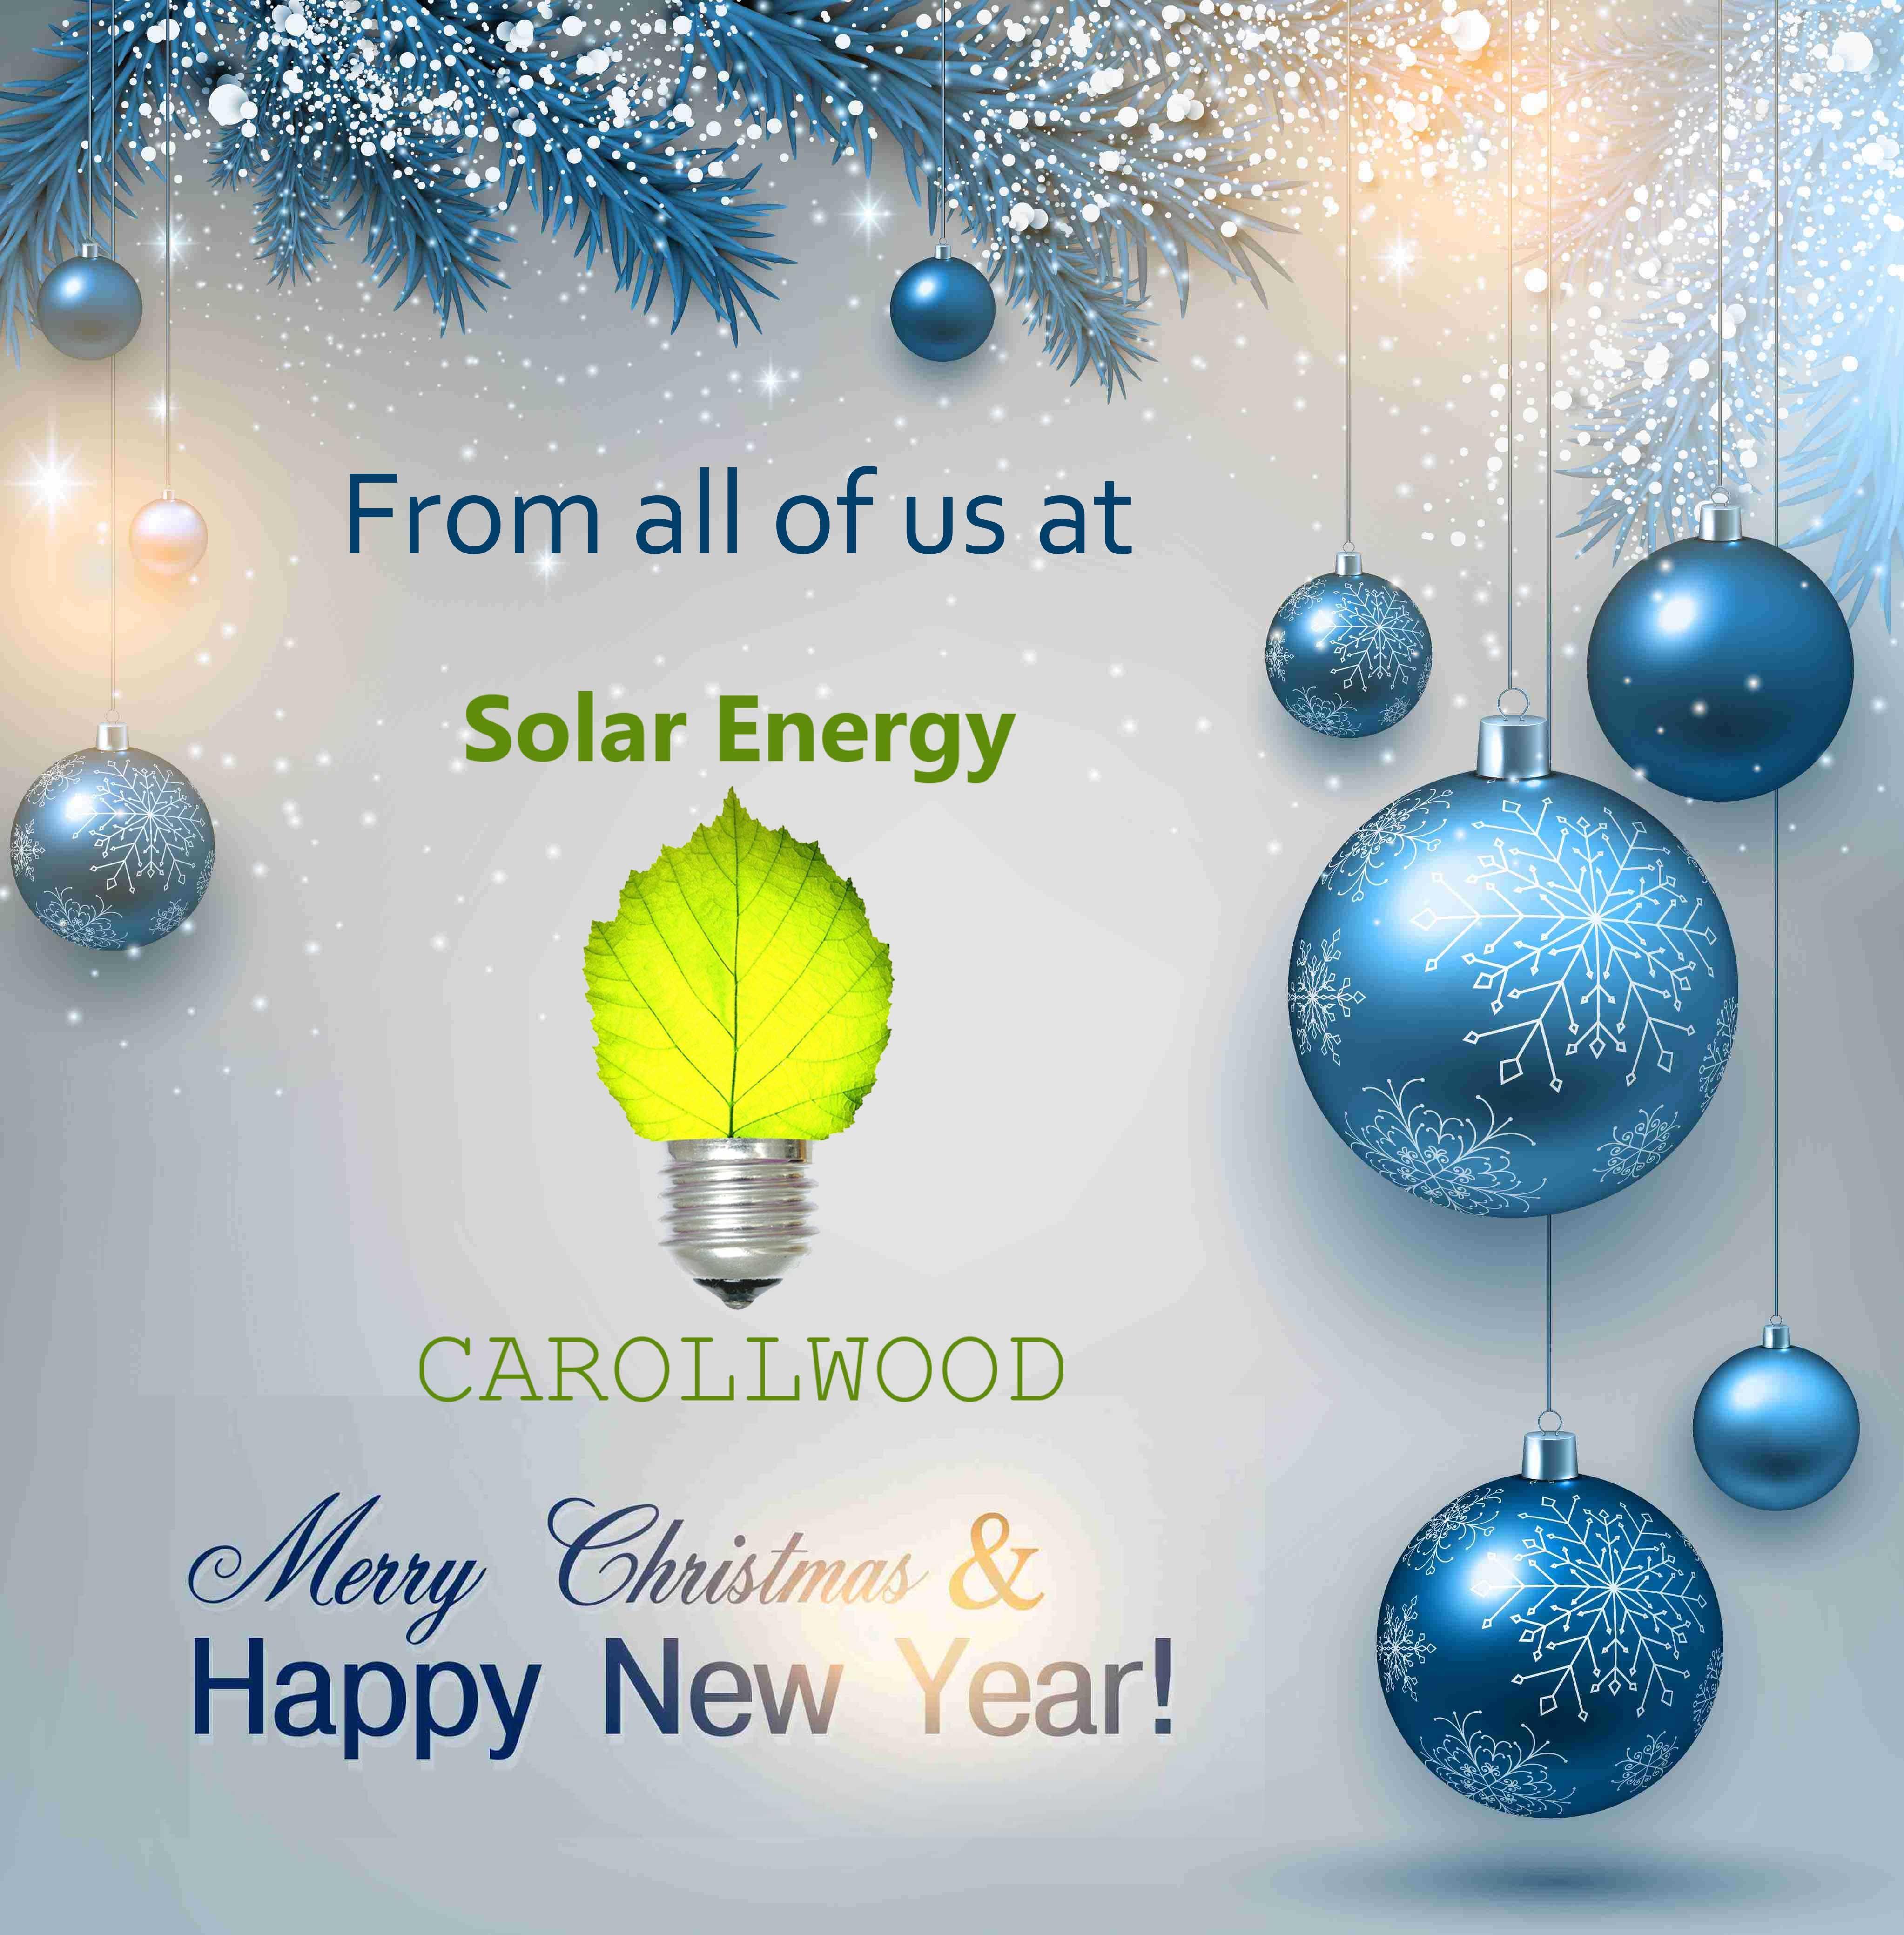 Happy Holidays! - http://solarenergycarrollwood.info/solar-energy/happy-holidays/